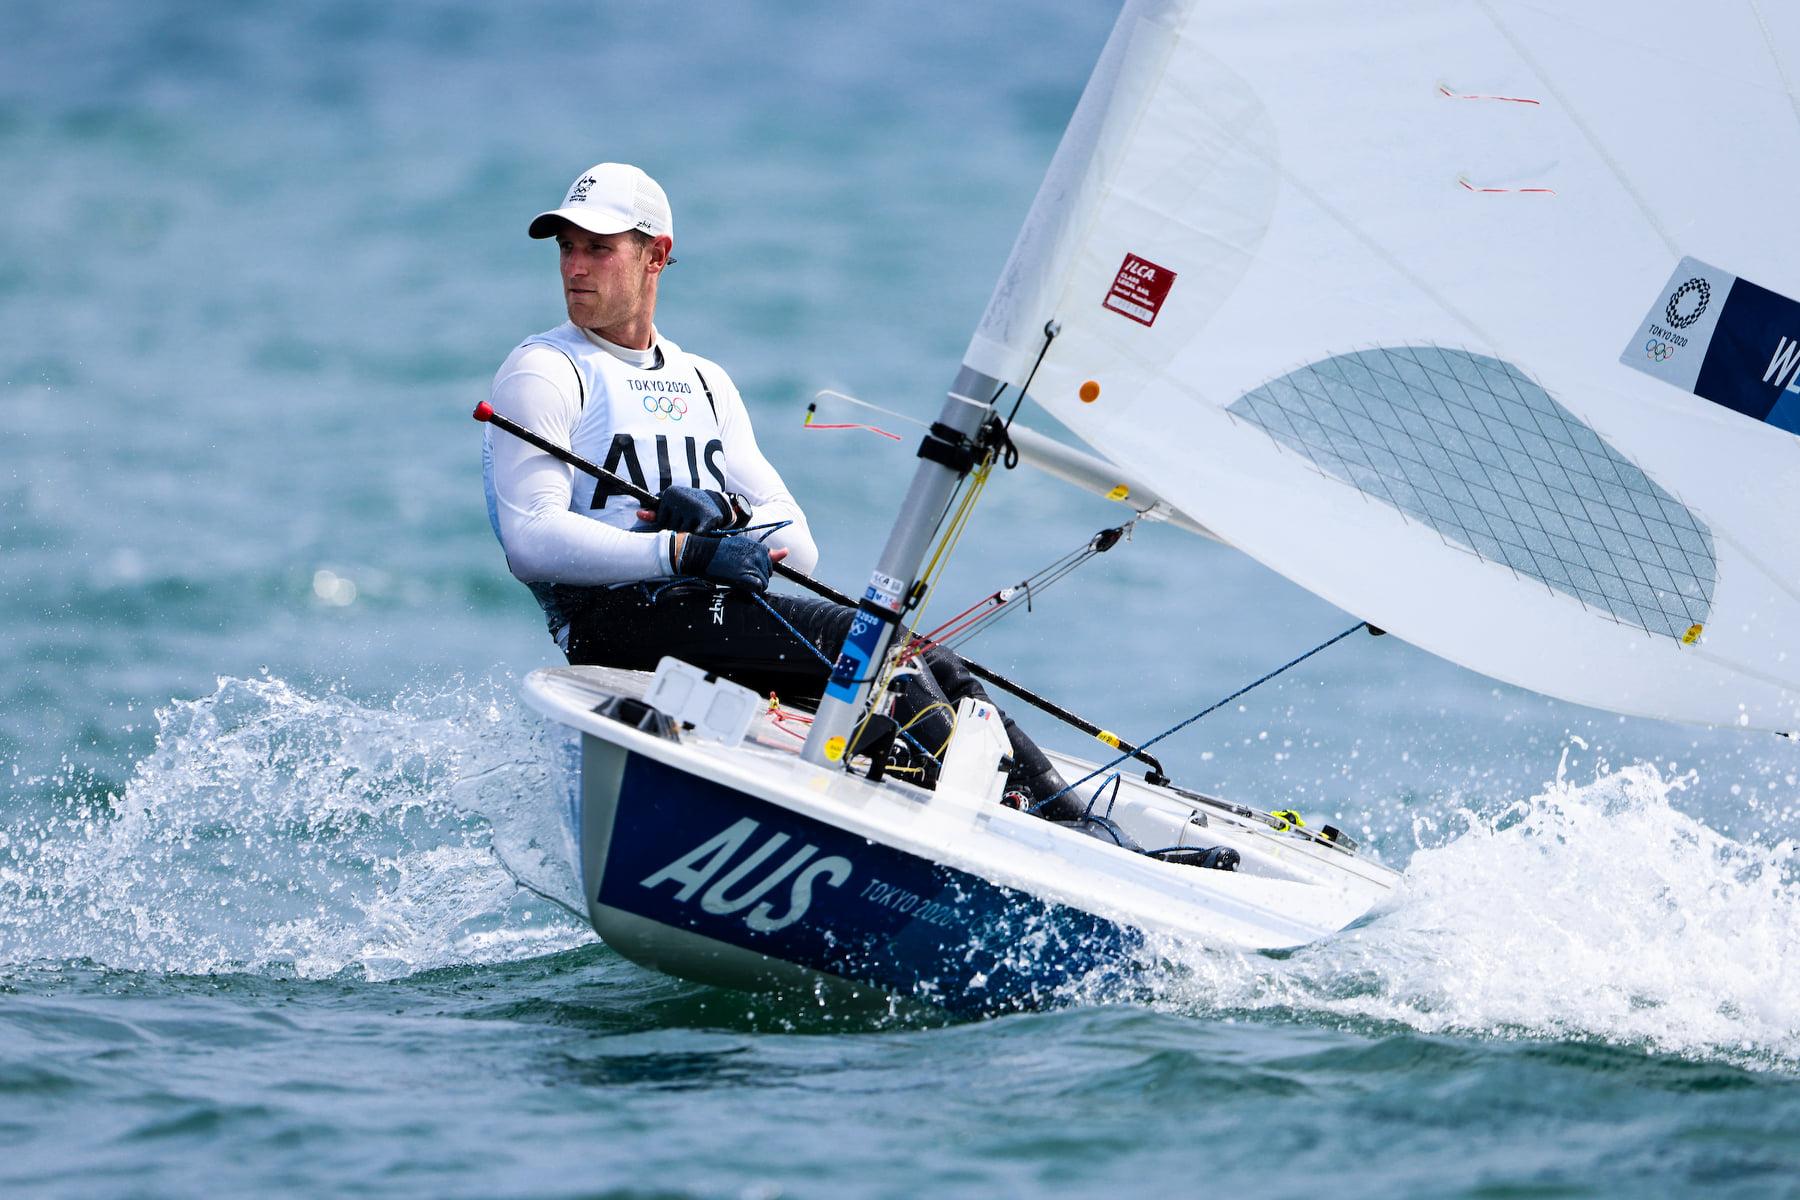 Perth sailor Matt Wearn